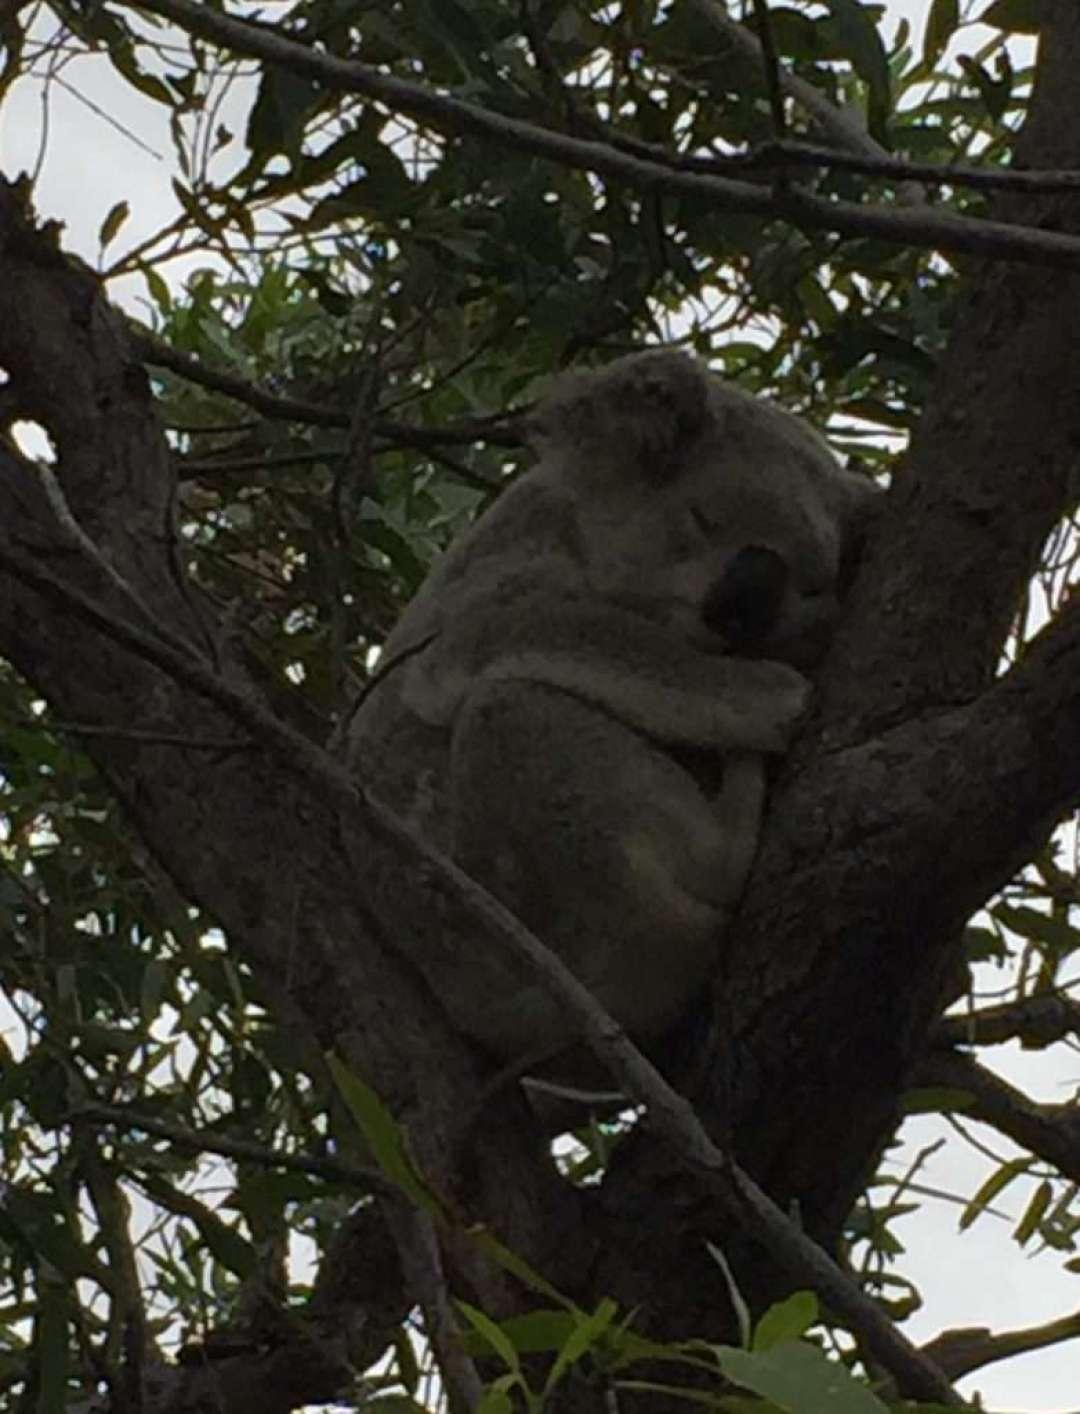 Koala sleeping in a tree next to the track.